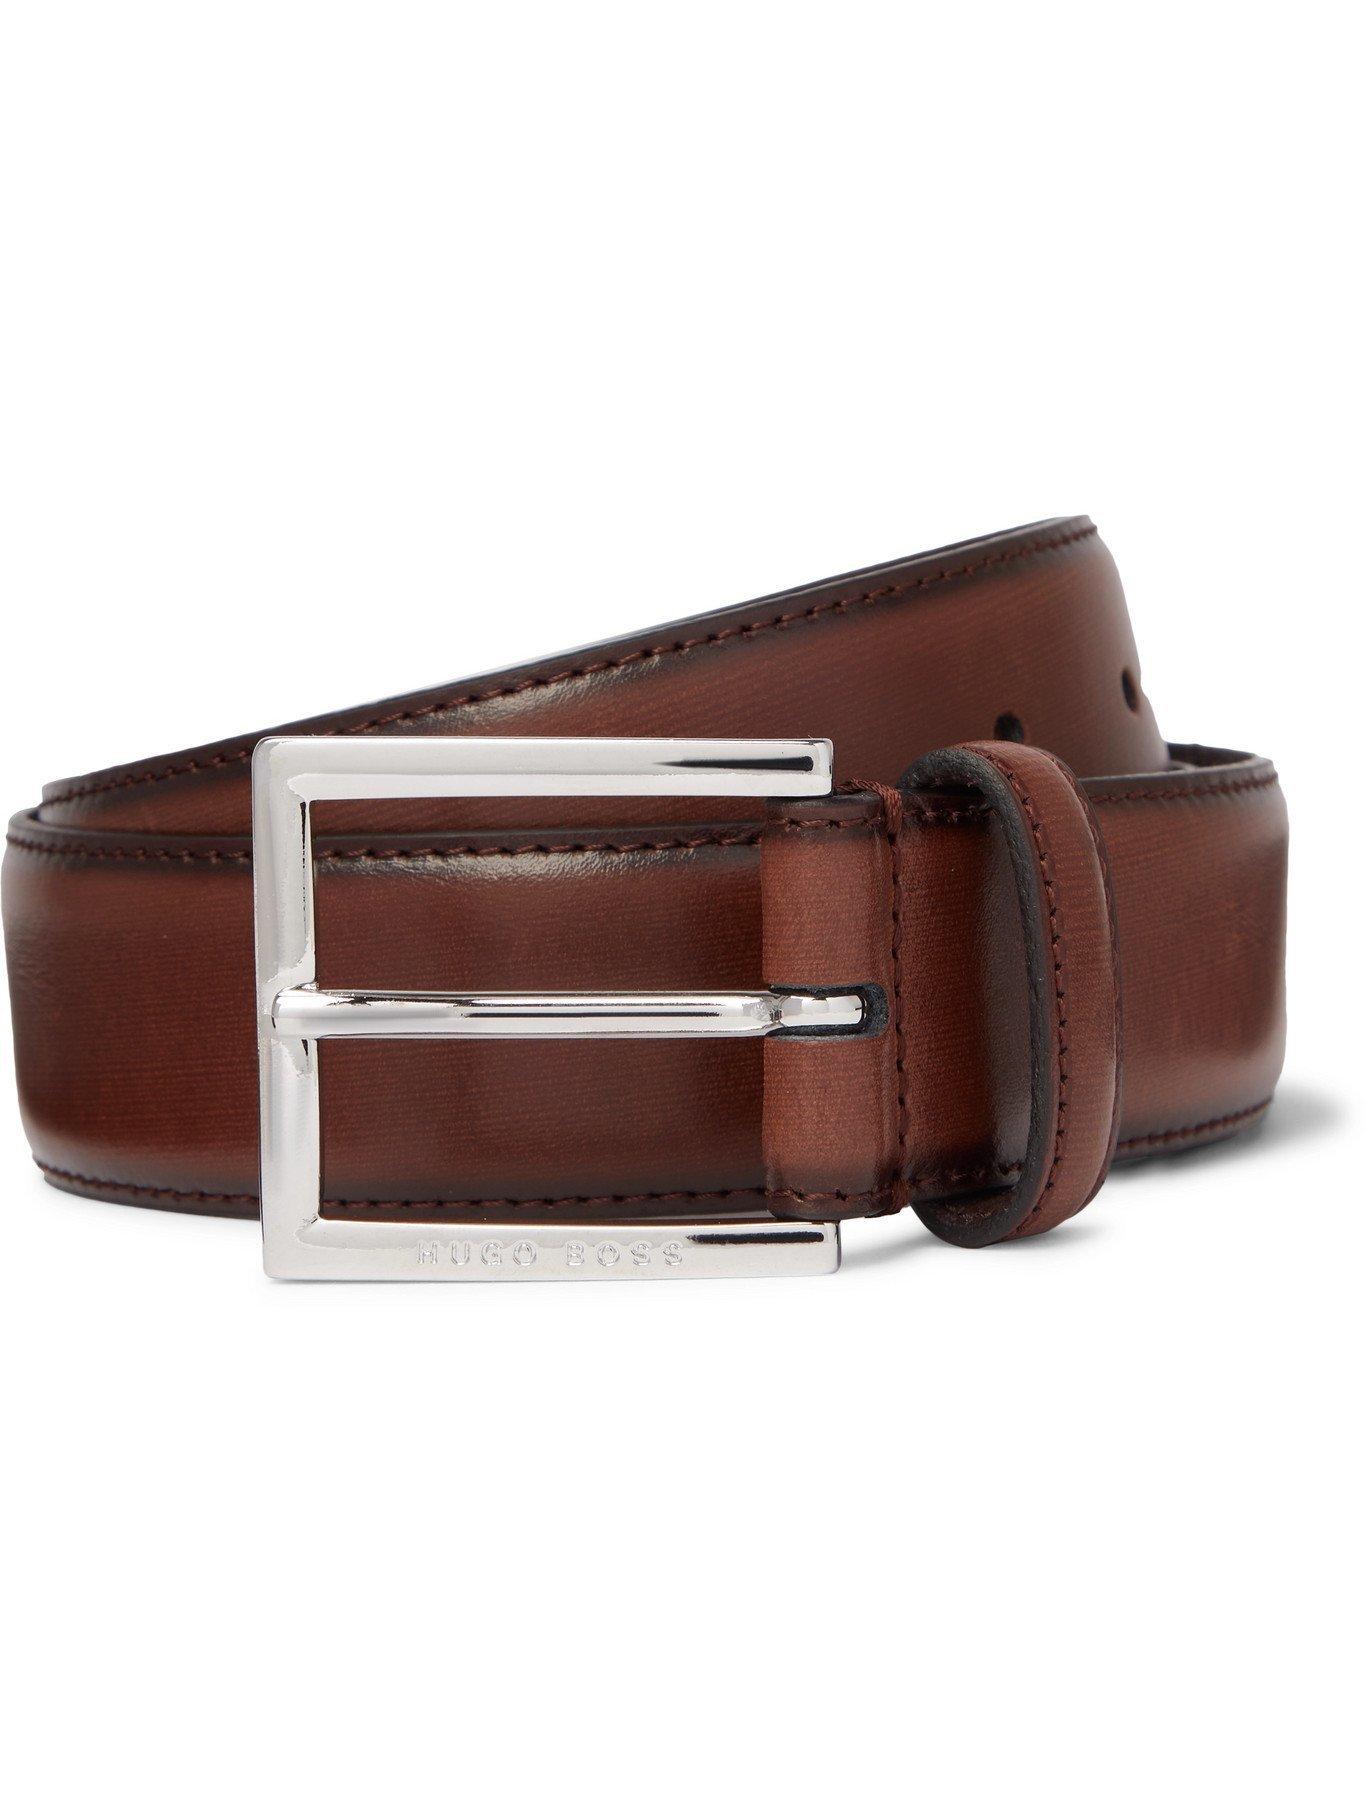 HUGO BOSS - 3.5cm Canzino Leather Belt - Brown - EU 100